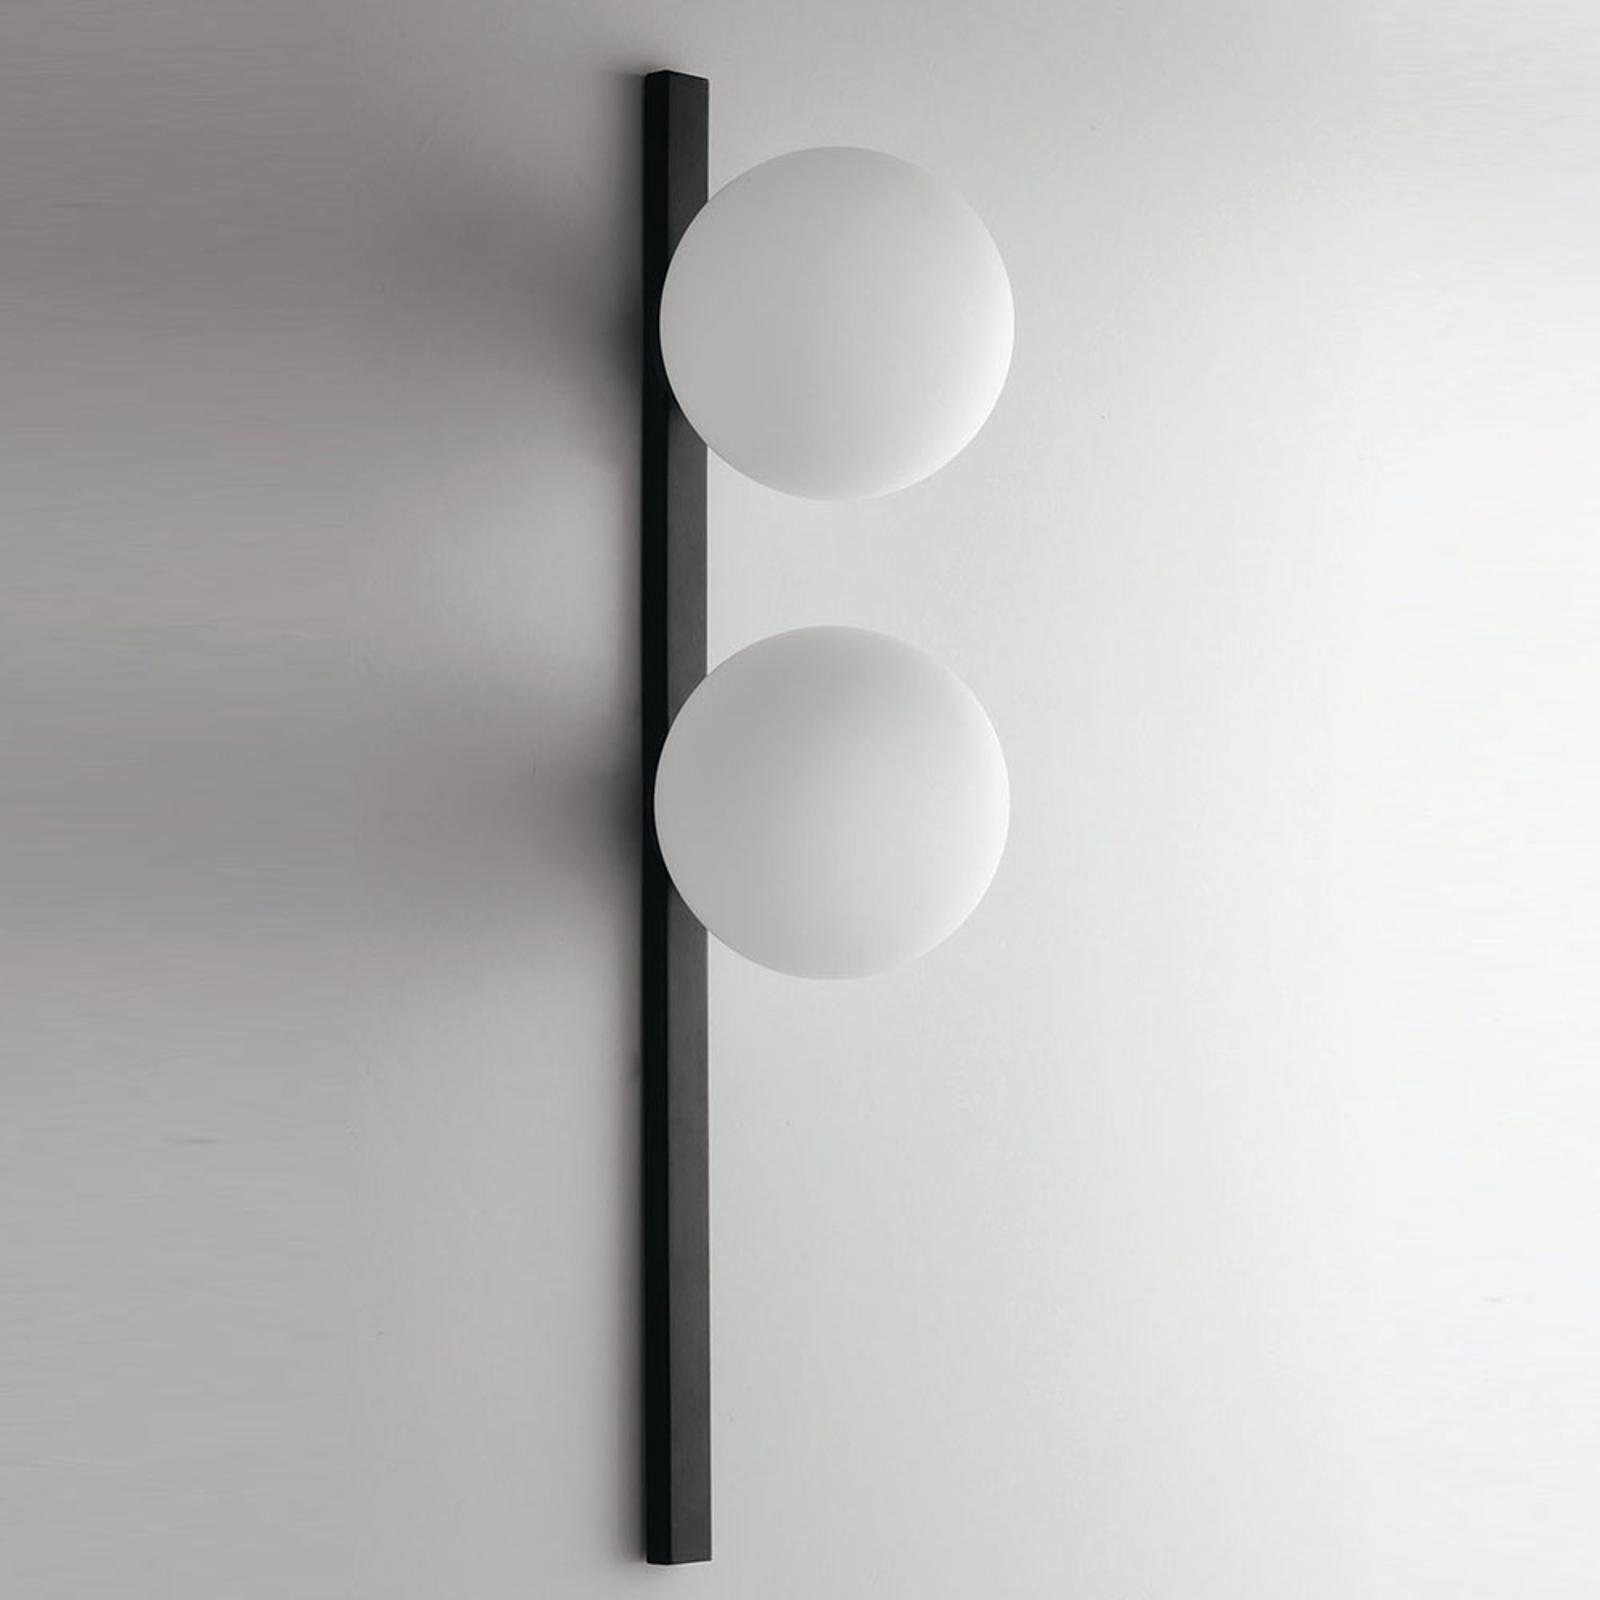 Wandlamp Enoire in zwart en wit, 2-lamps